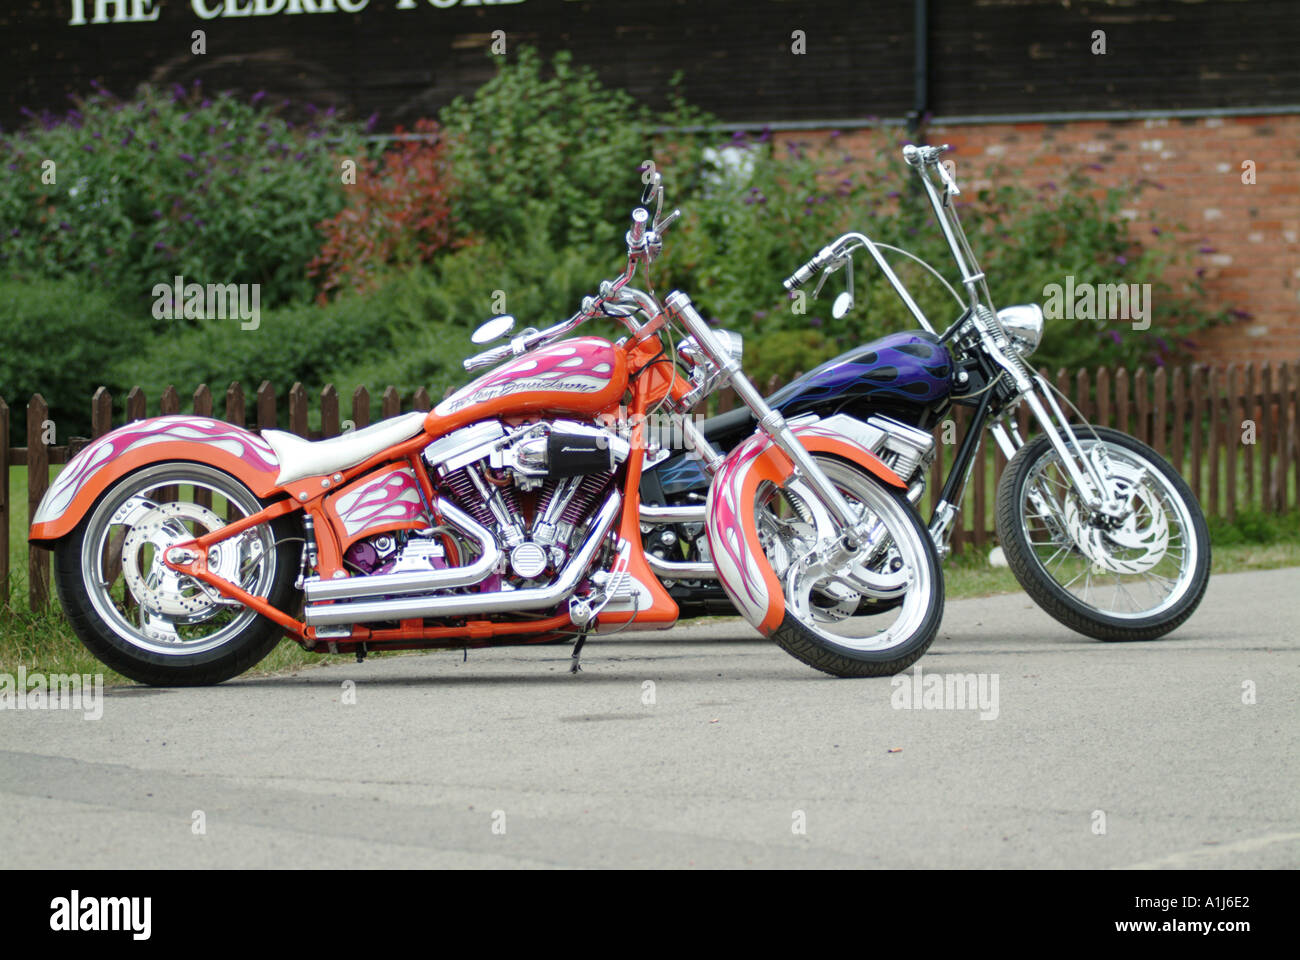 harley davidson custom motor cycle bike v twin american america customised modified chopper Stock Photo